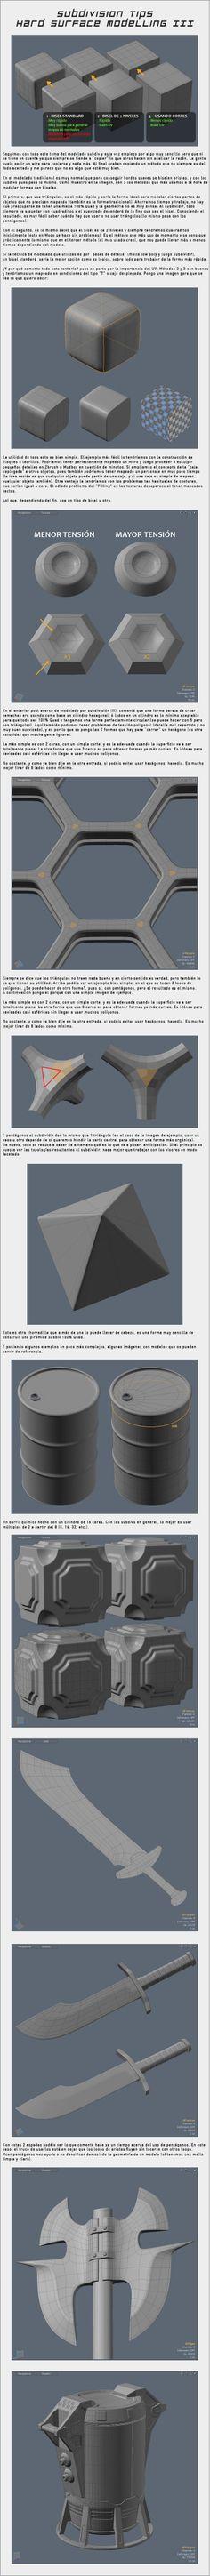 Subdivision Tips - Hard-Surface Modelling III by WhiteBlaizer